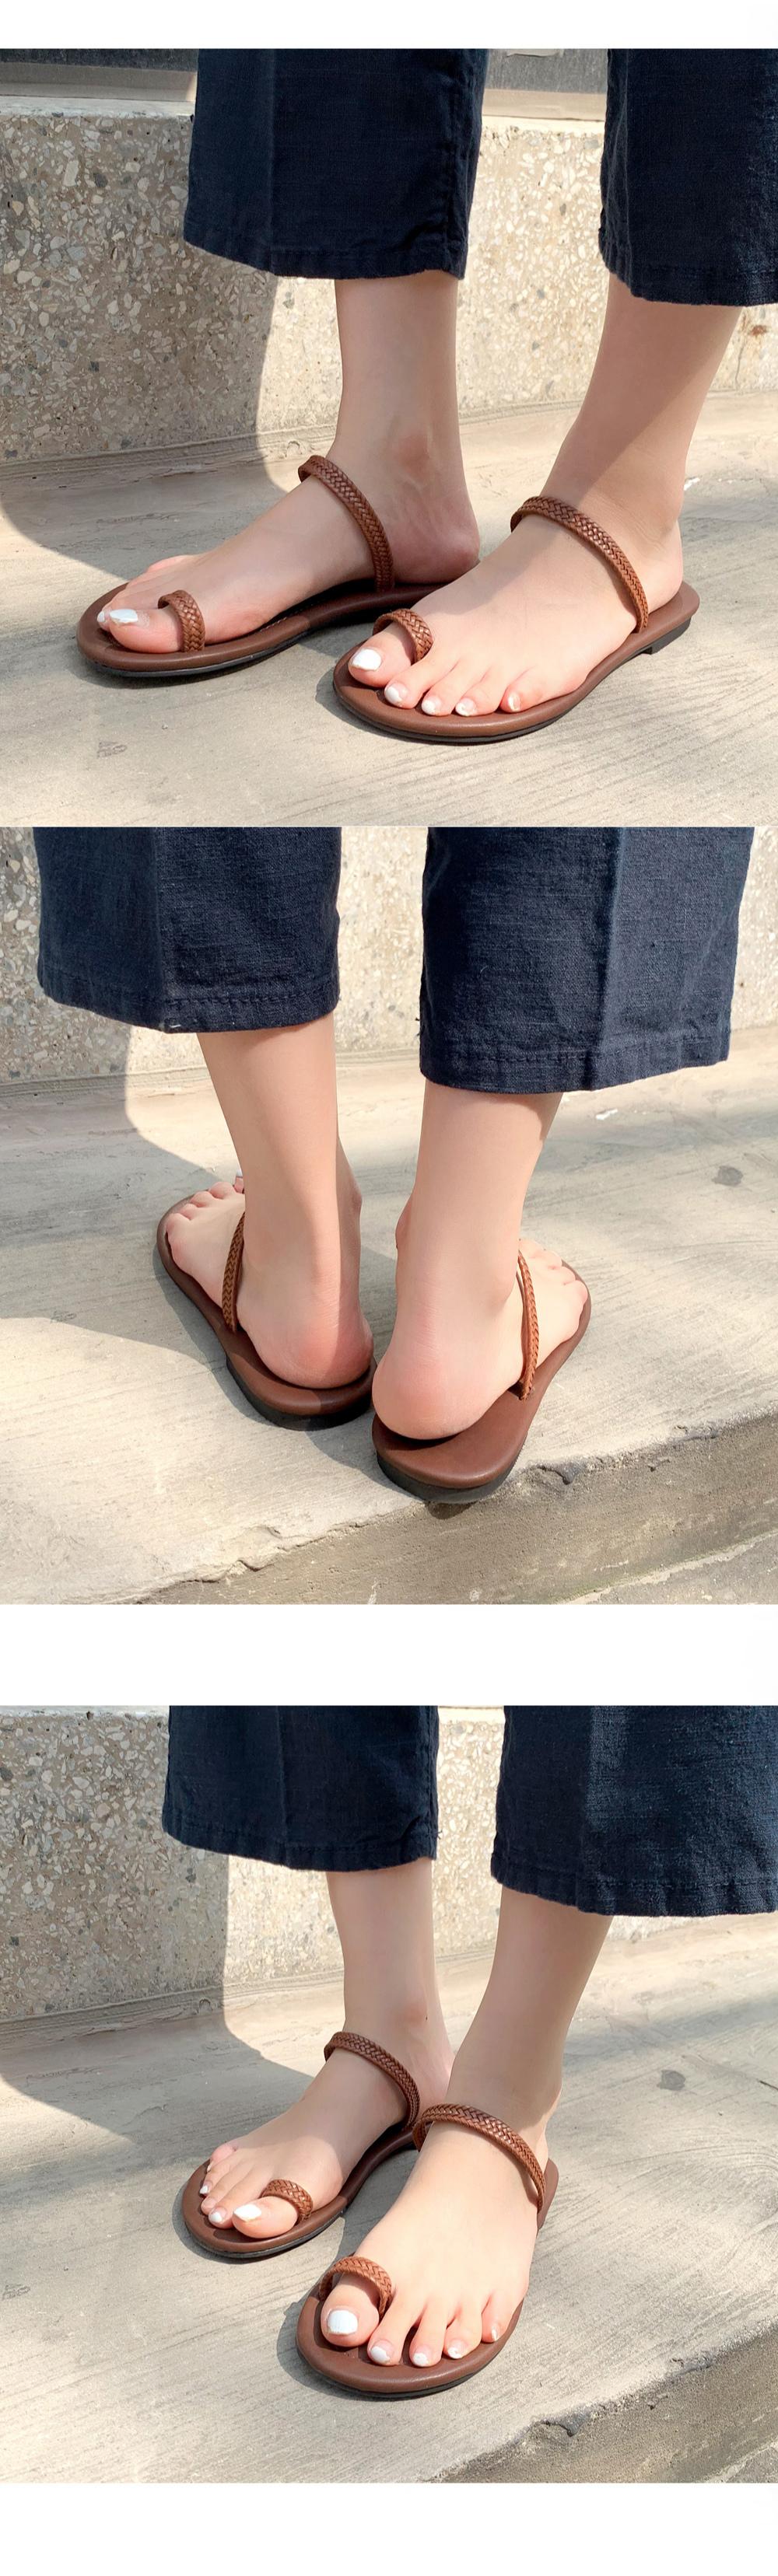 Lita Thumb Sandals